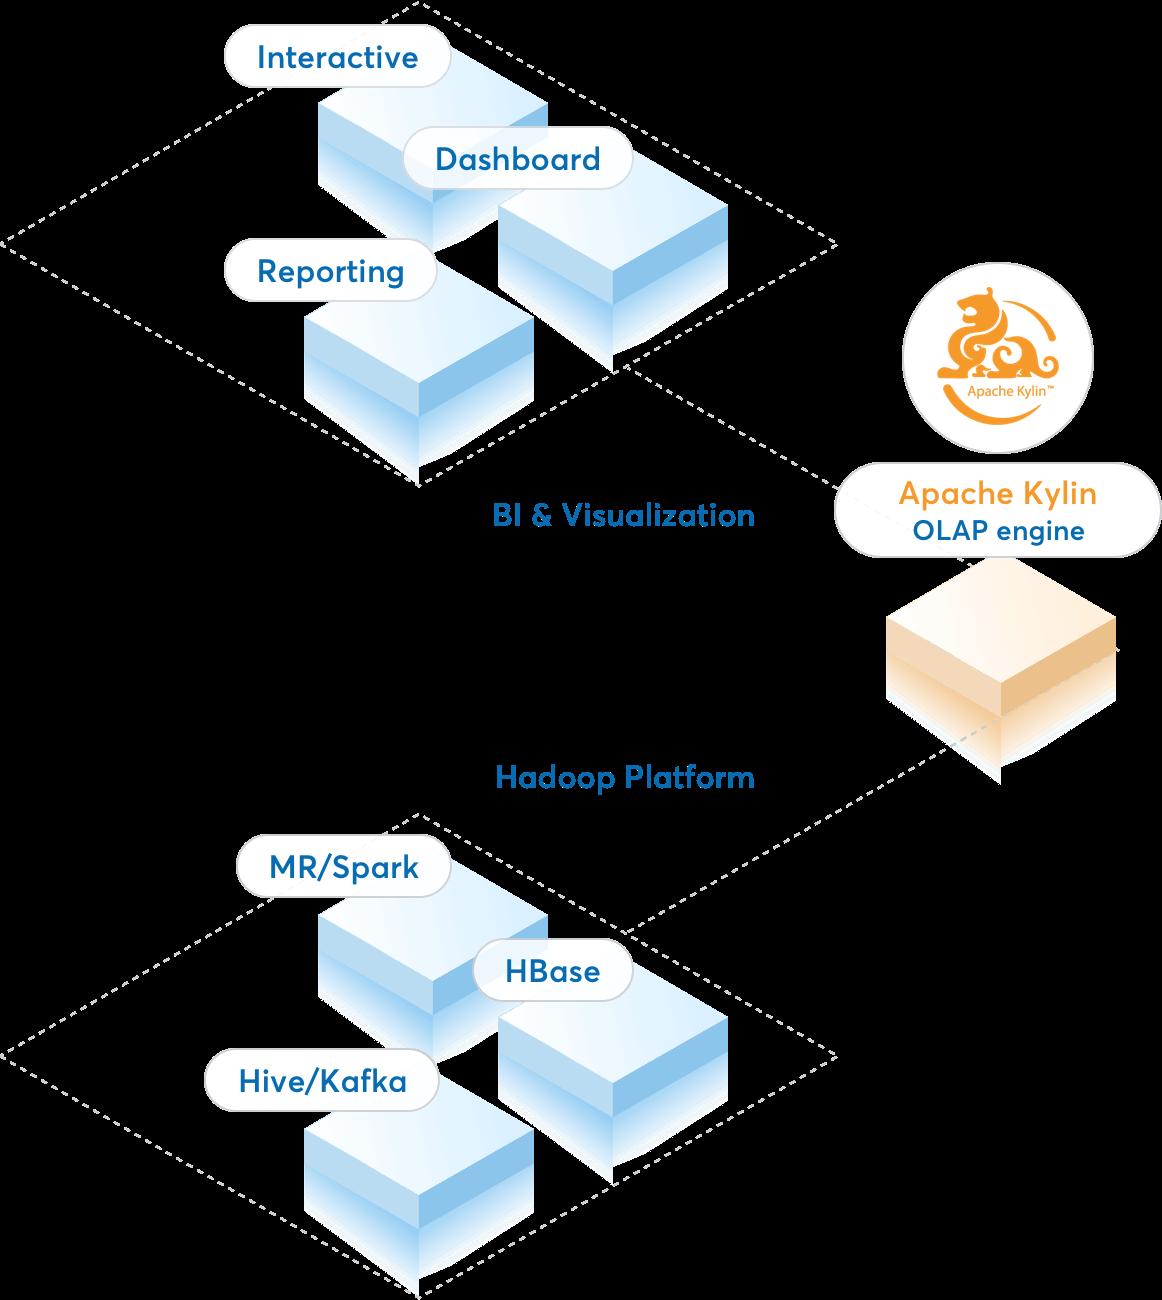 Apache Kylin – Open Source OLAP for Big Data | Kyligence